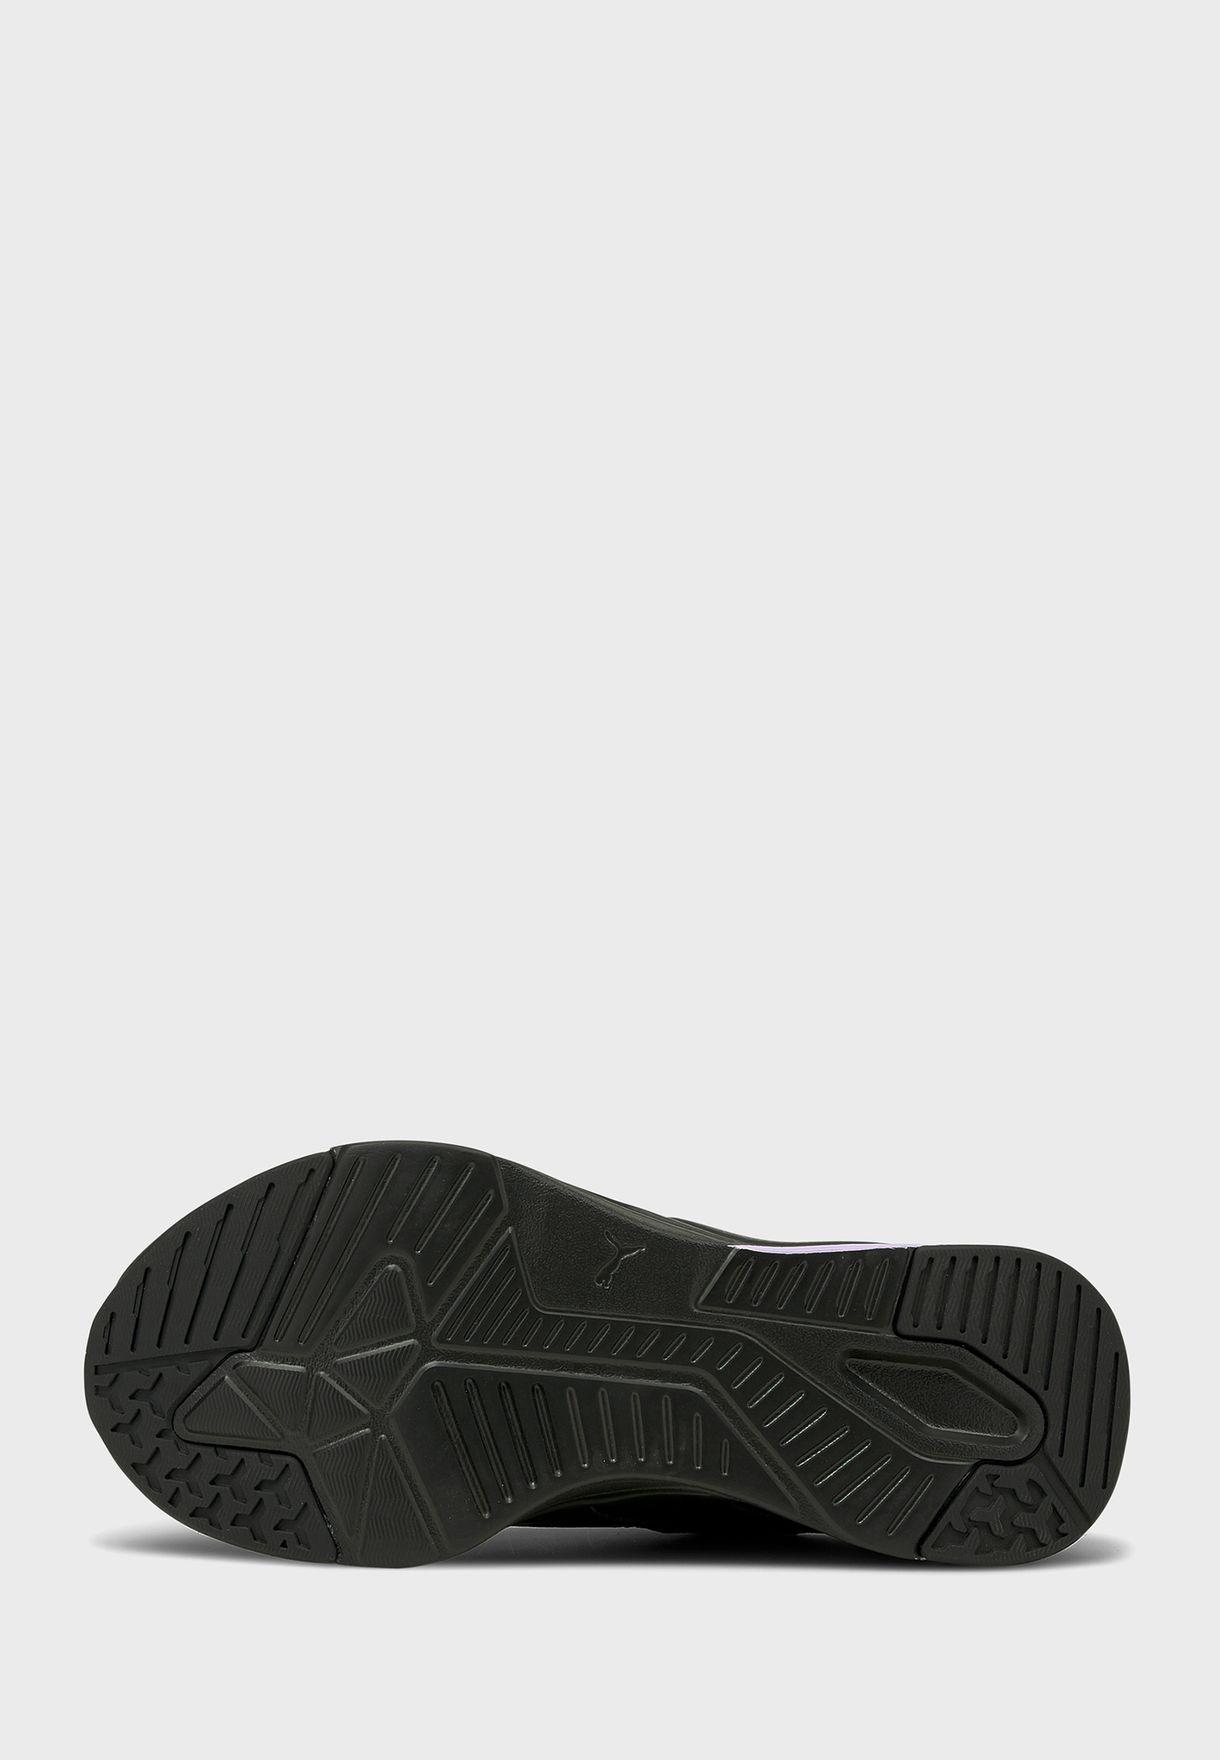 حذاء ديسبيرس اكس تي للنساء